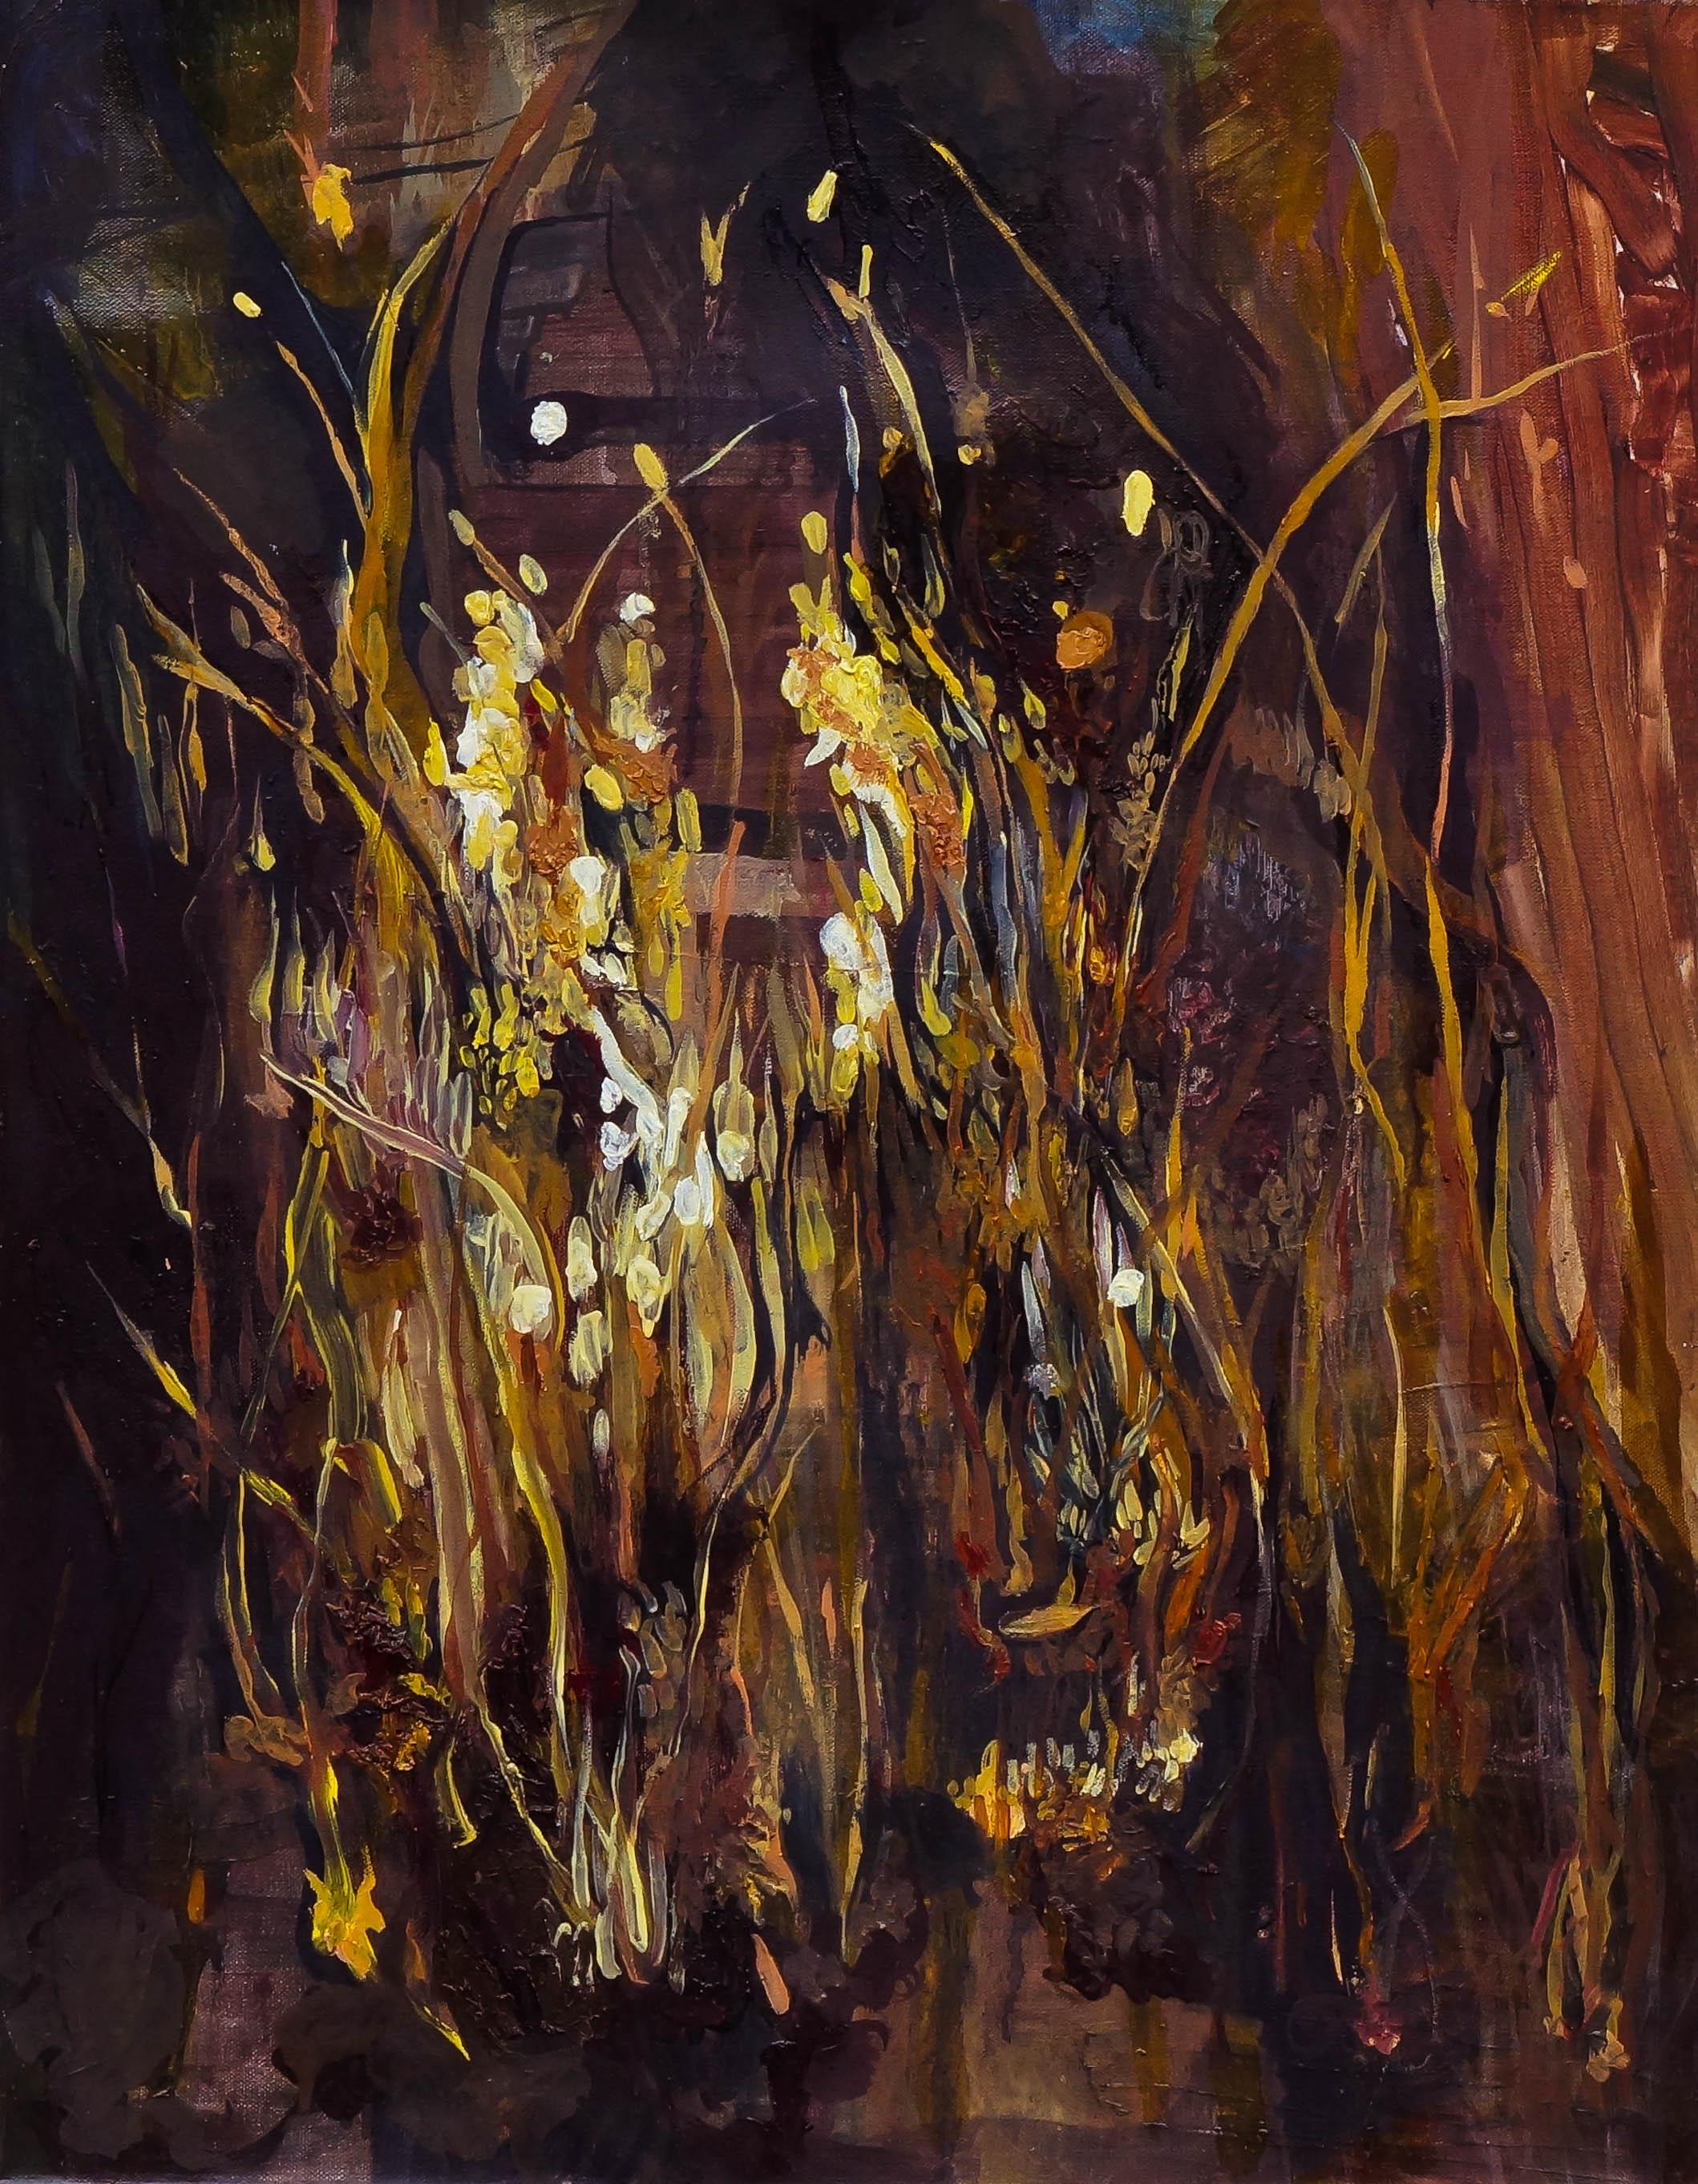 North Diamond Street Grass, oil on canvas, 18 x 24 inches